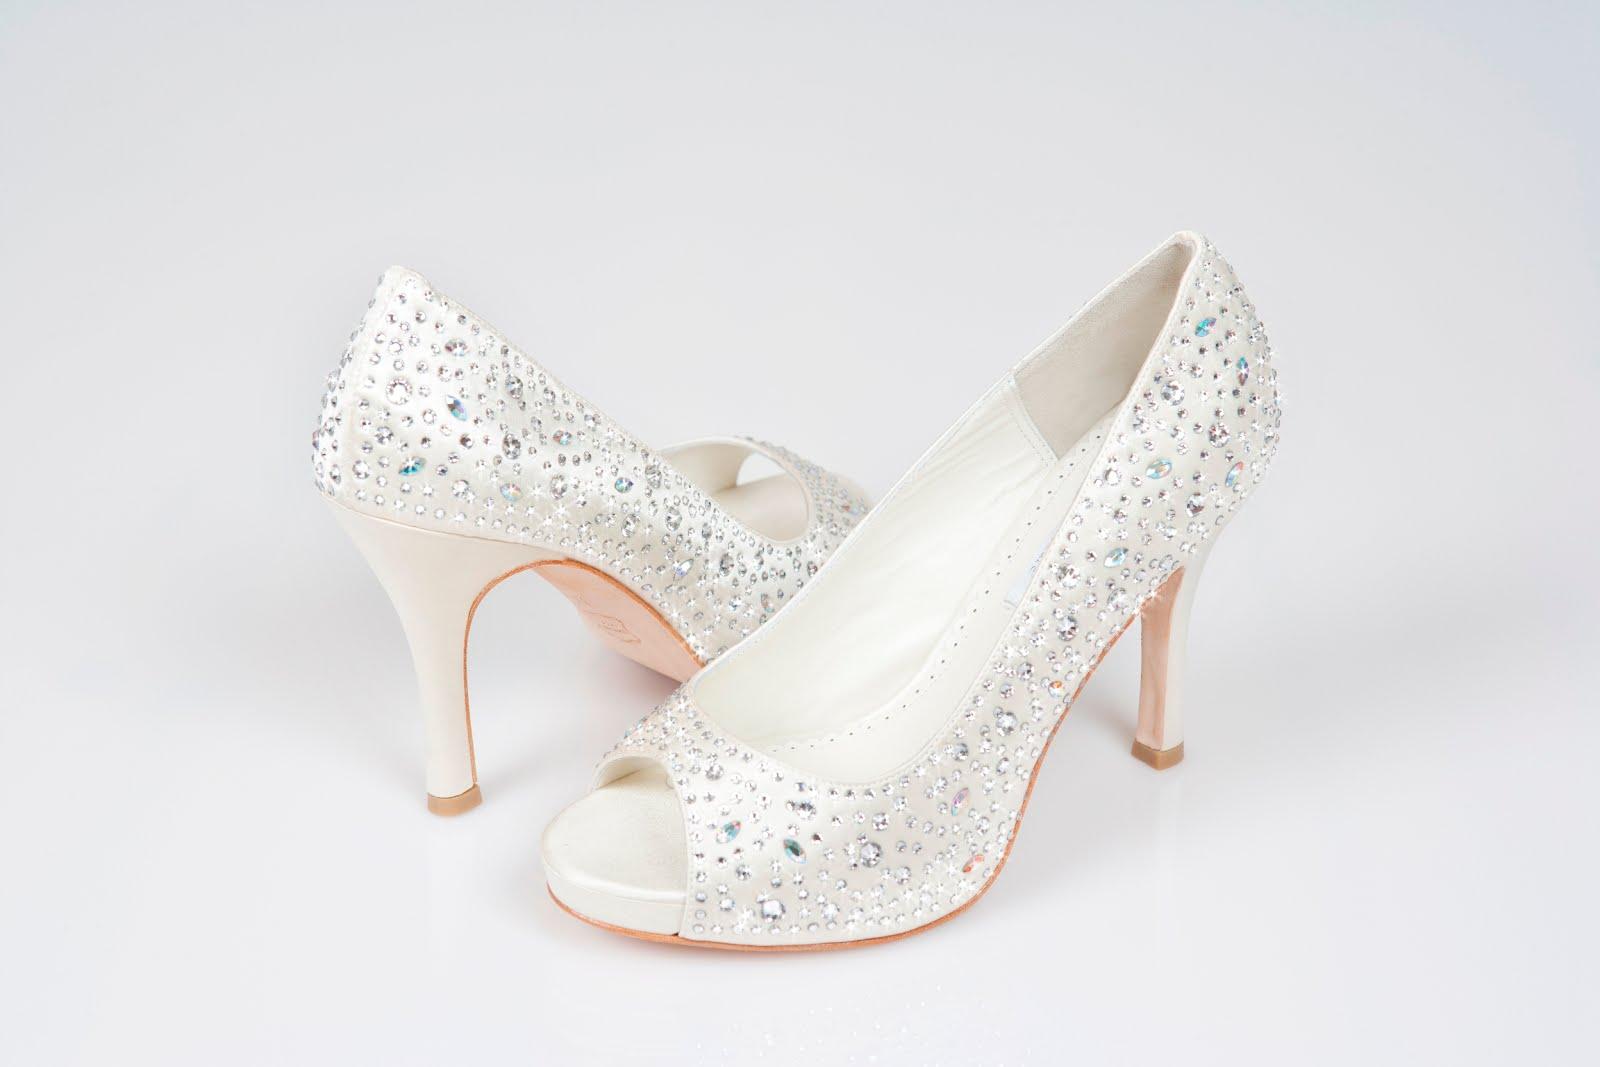 paradox bridal shoes bridal shoes low low heel wedding shoes Paradox Bridal Shoes Bridal Shoes Low Heel UK Wedges Flats Designer Photos Pics Images Wallpapers